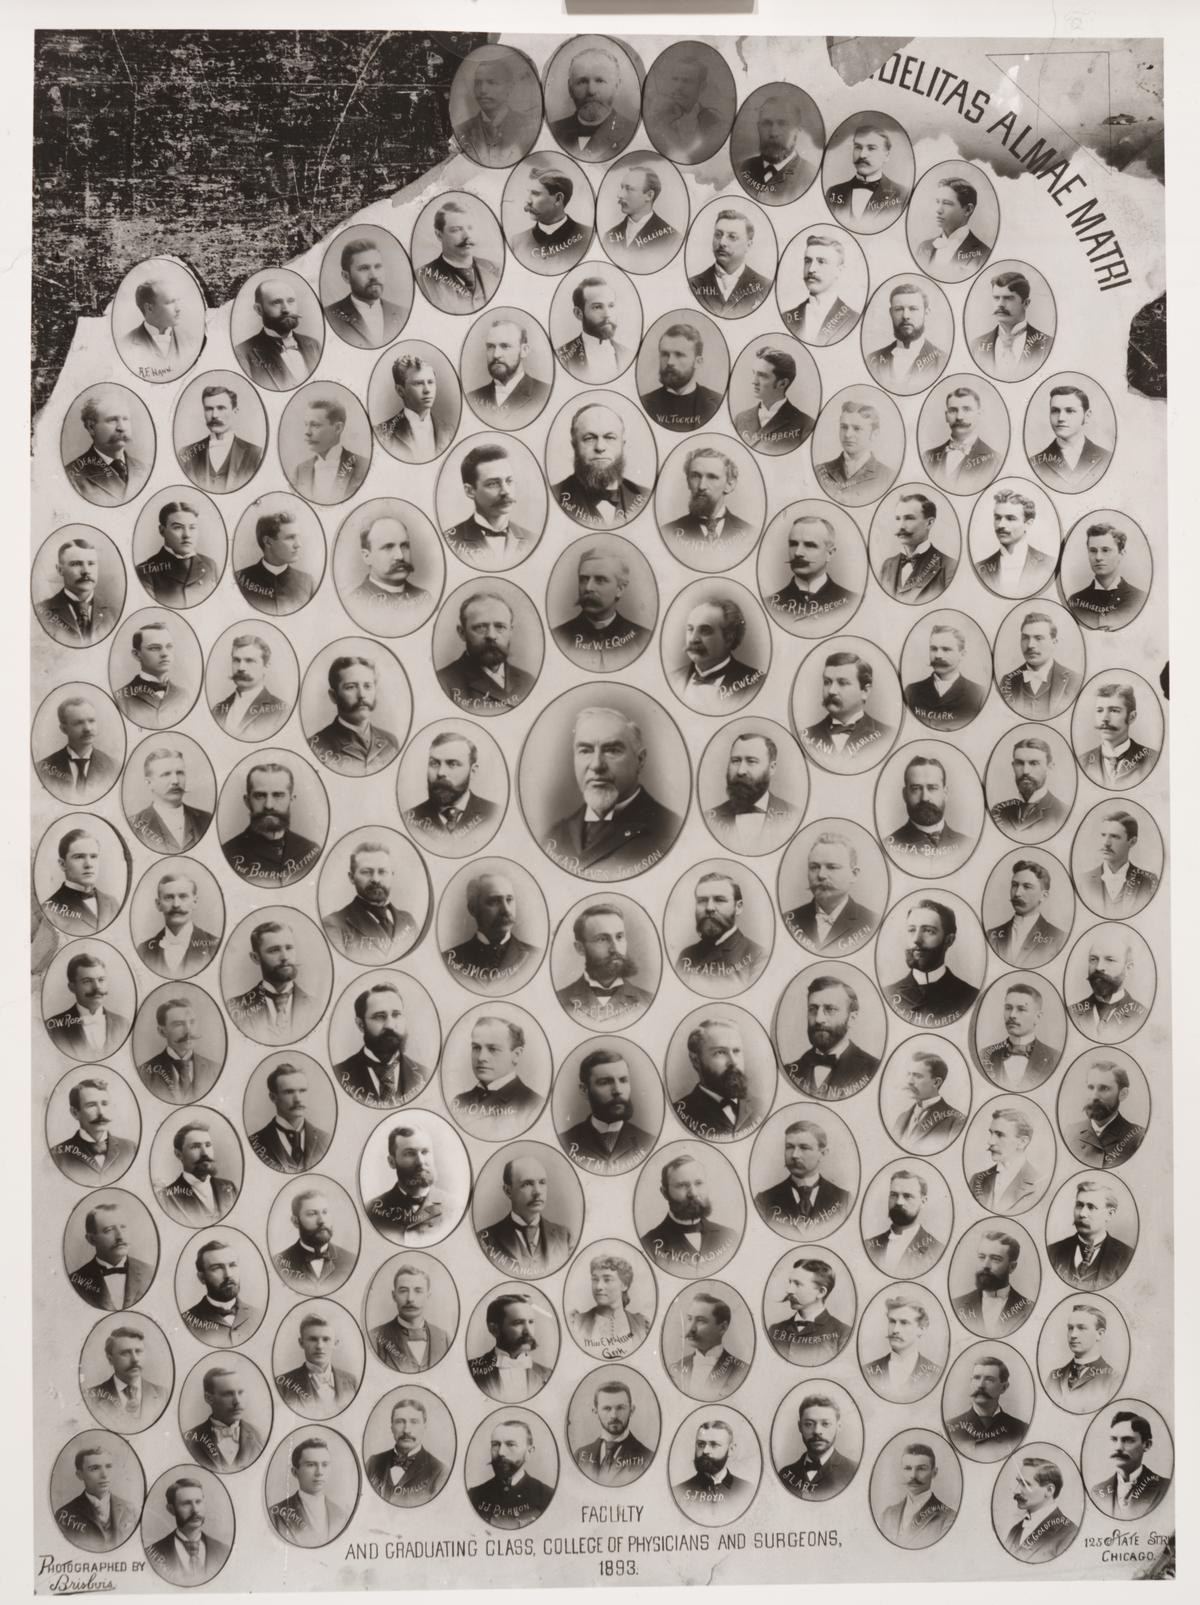 1893 graduating class, University of Illinois College of Medicine